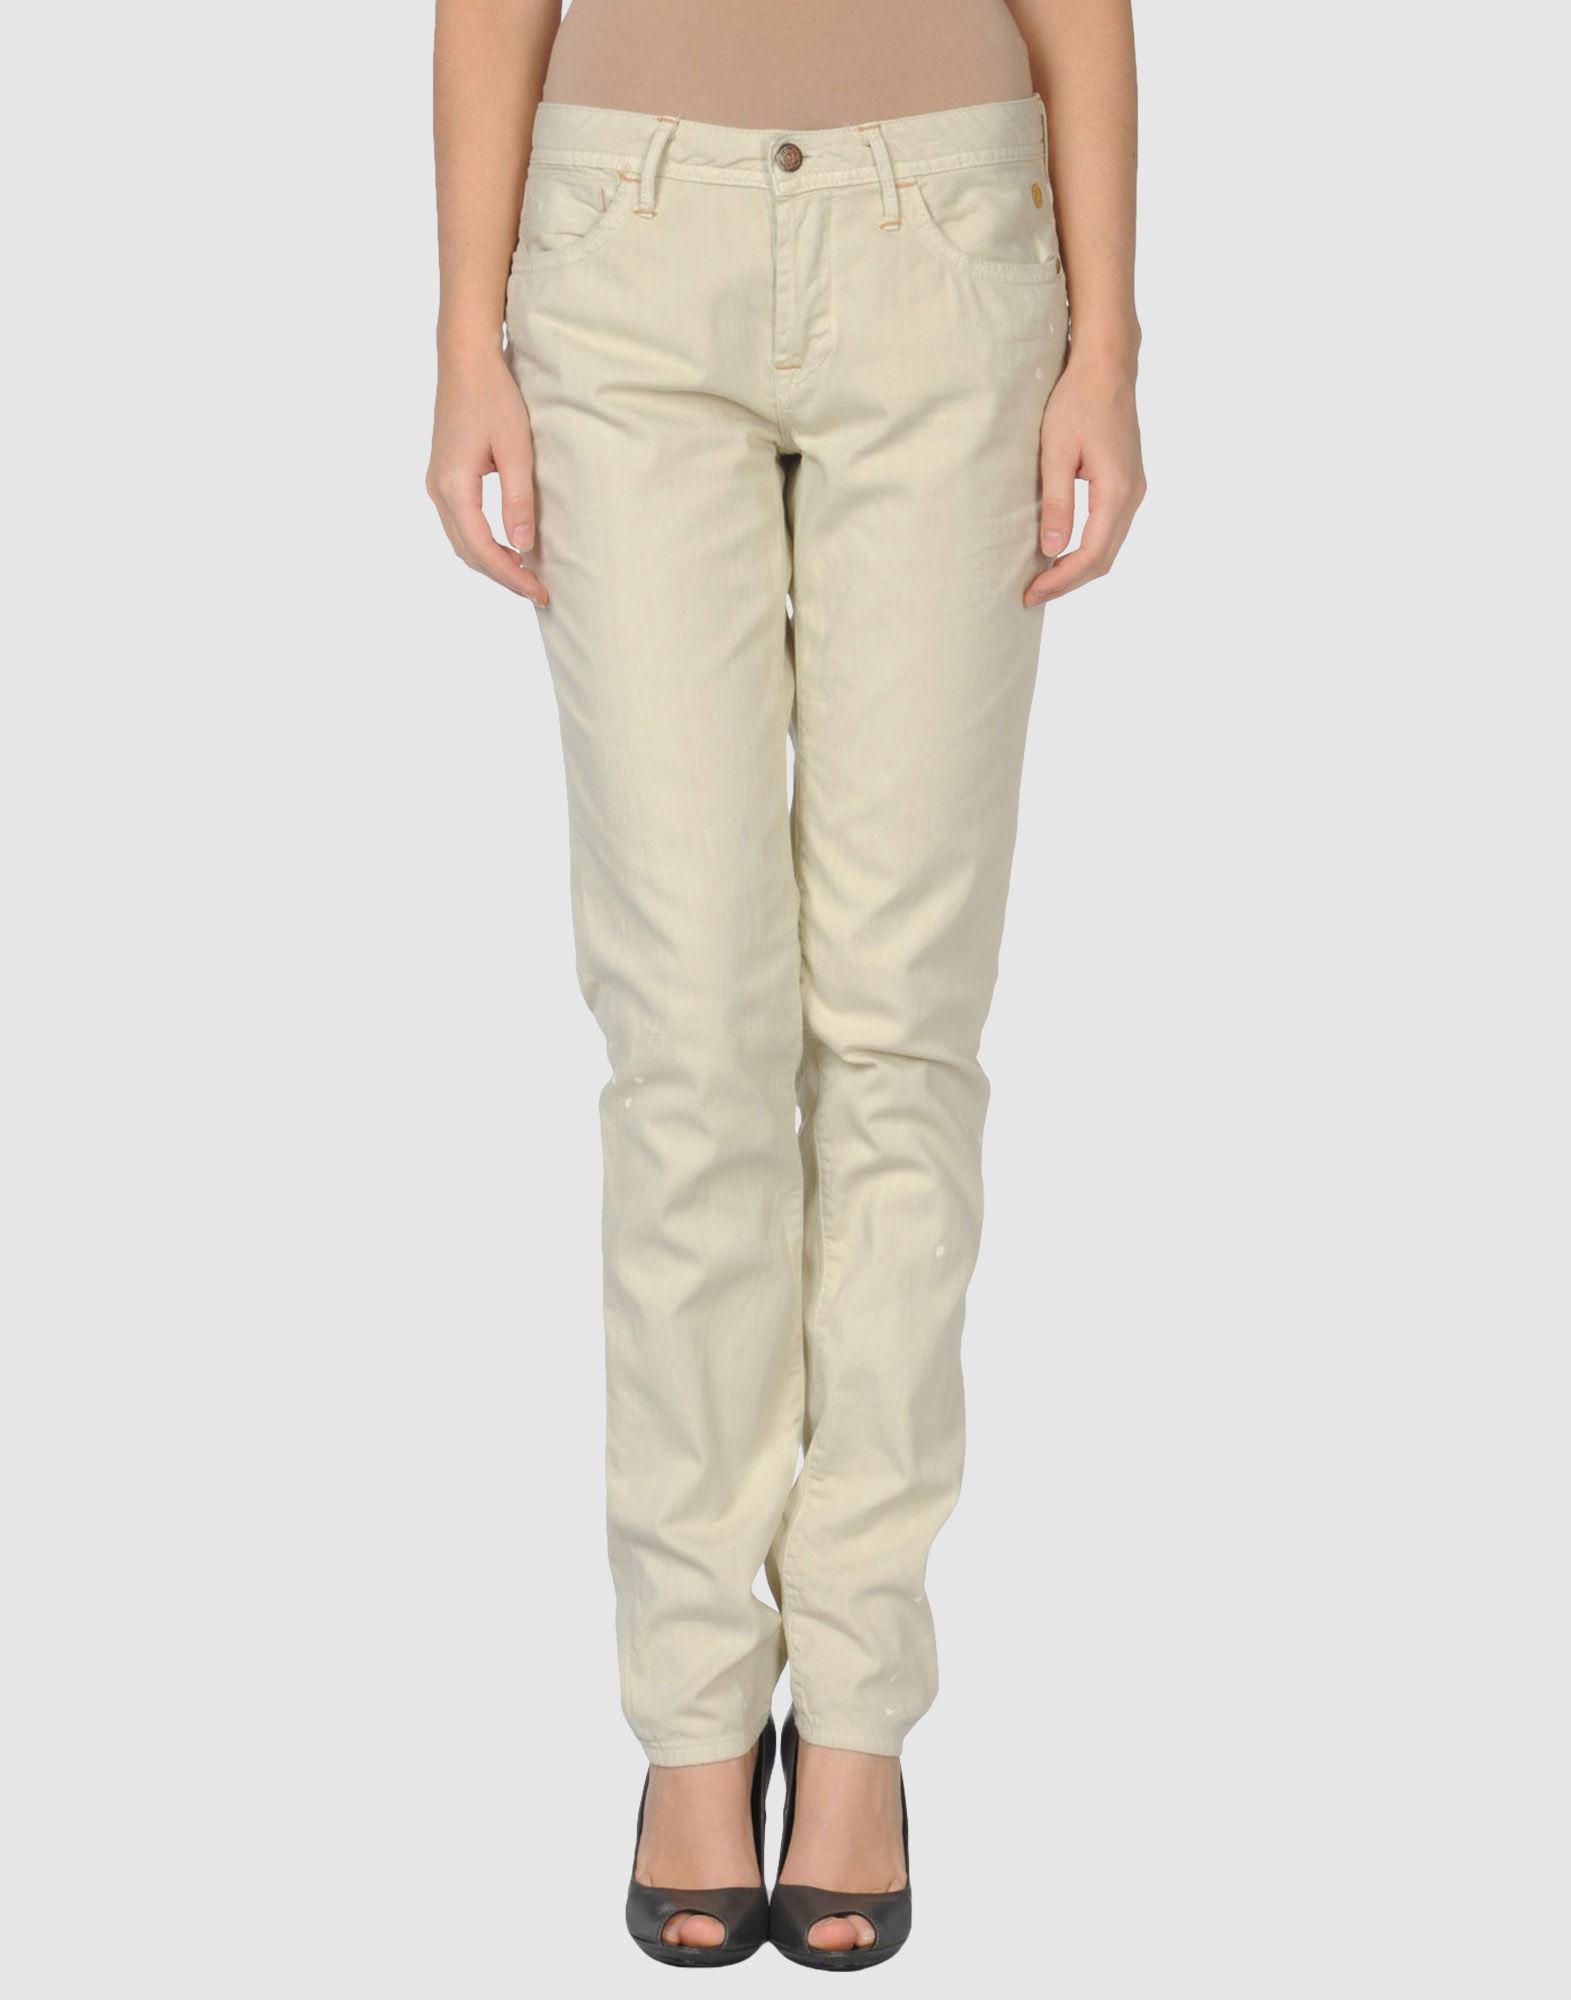 COAST WEBER & AHAUS Джинсовые брюки блузка coast weber